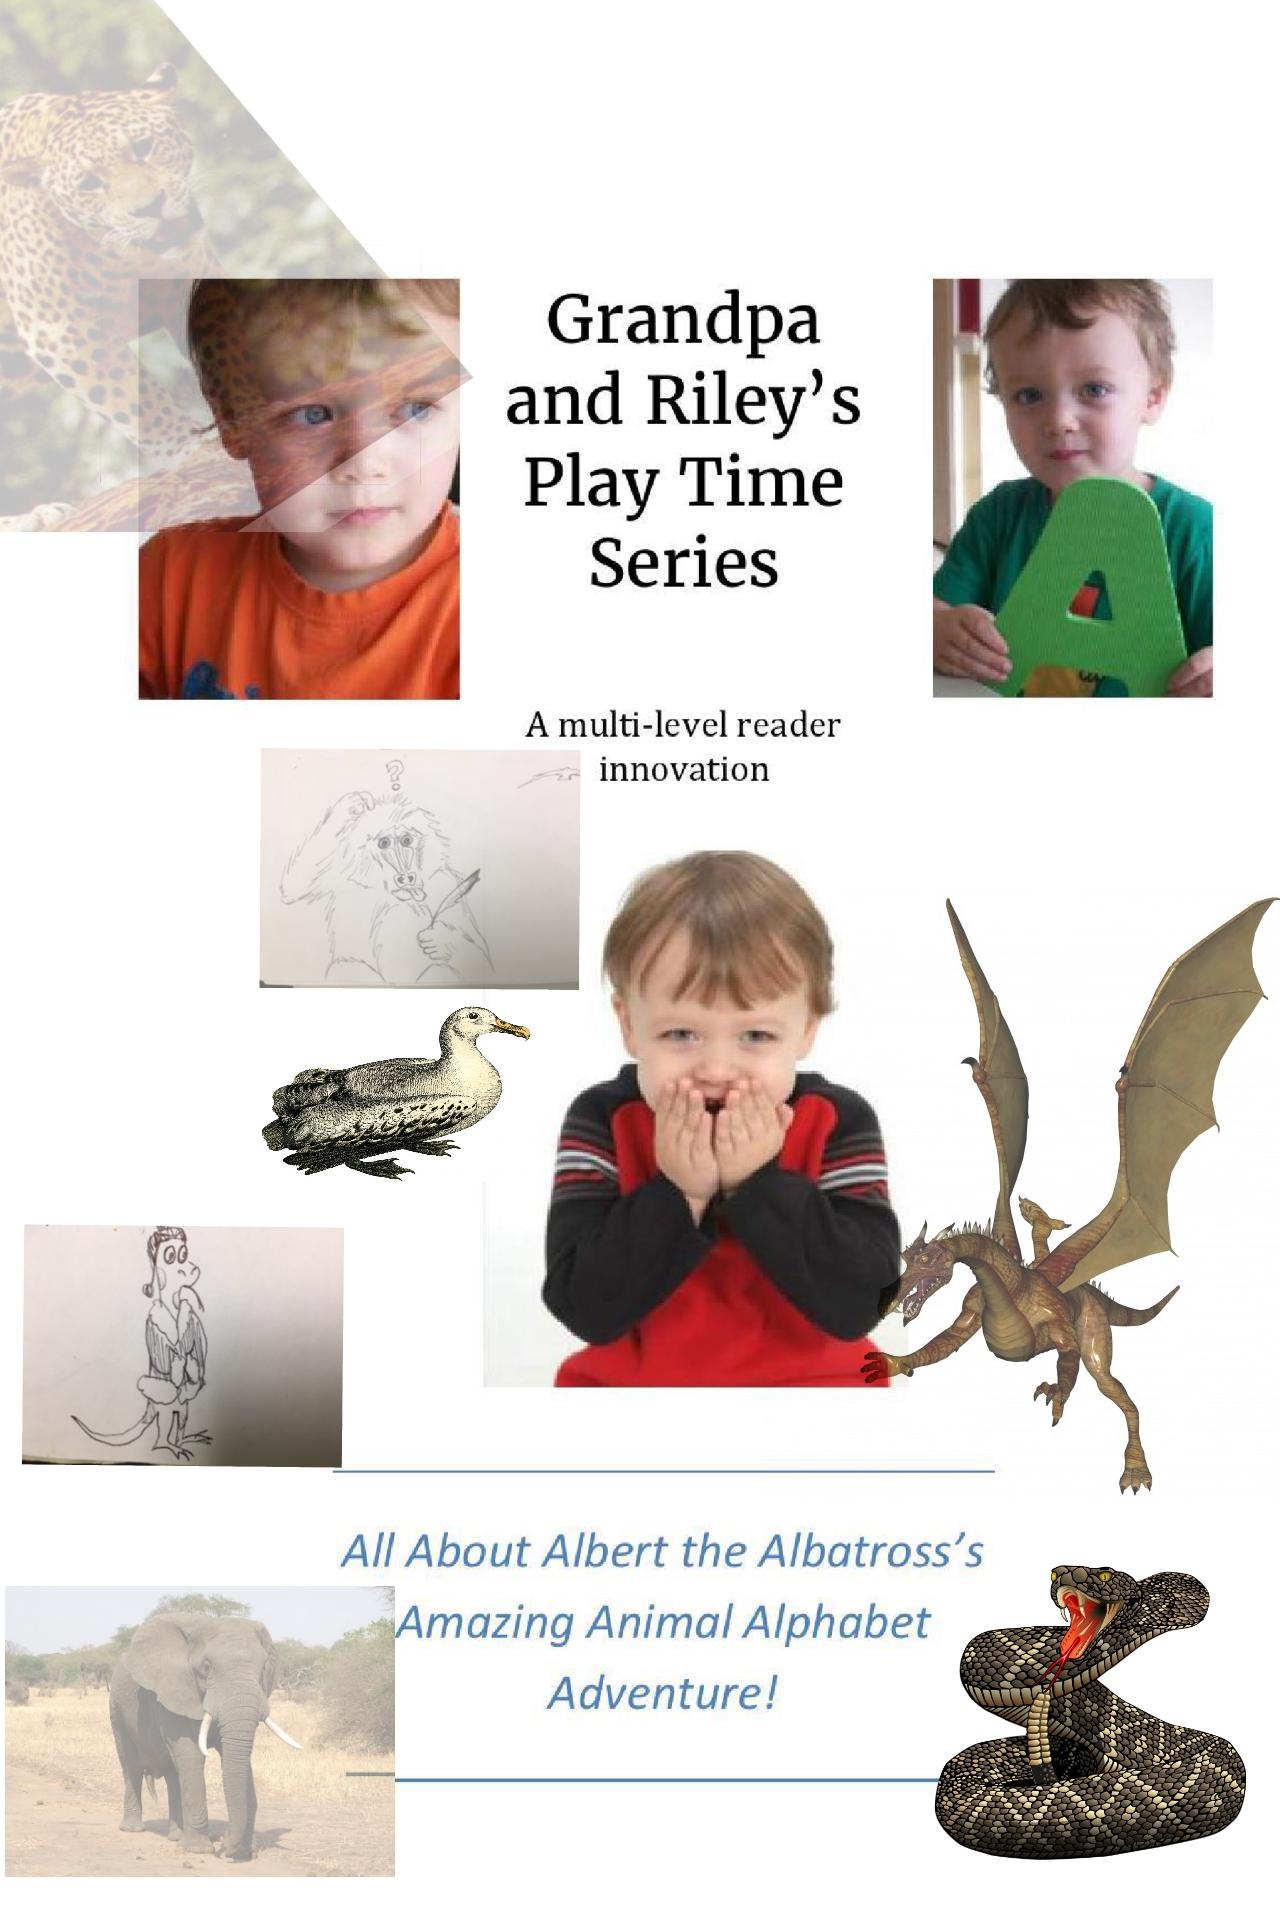 All about albert the albatross's amazing animal alphabet adventure!